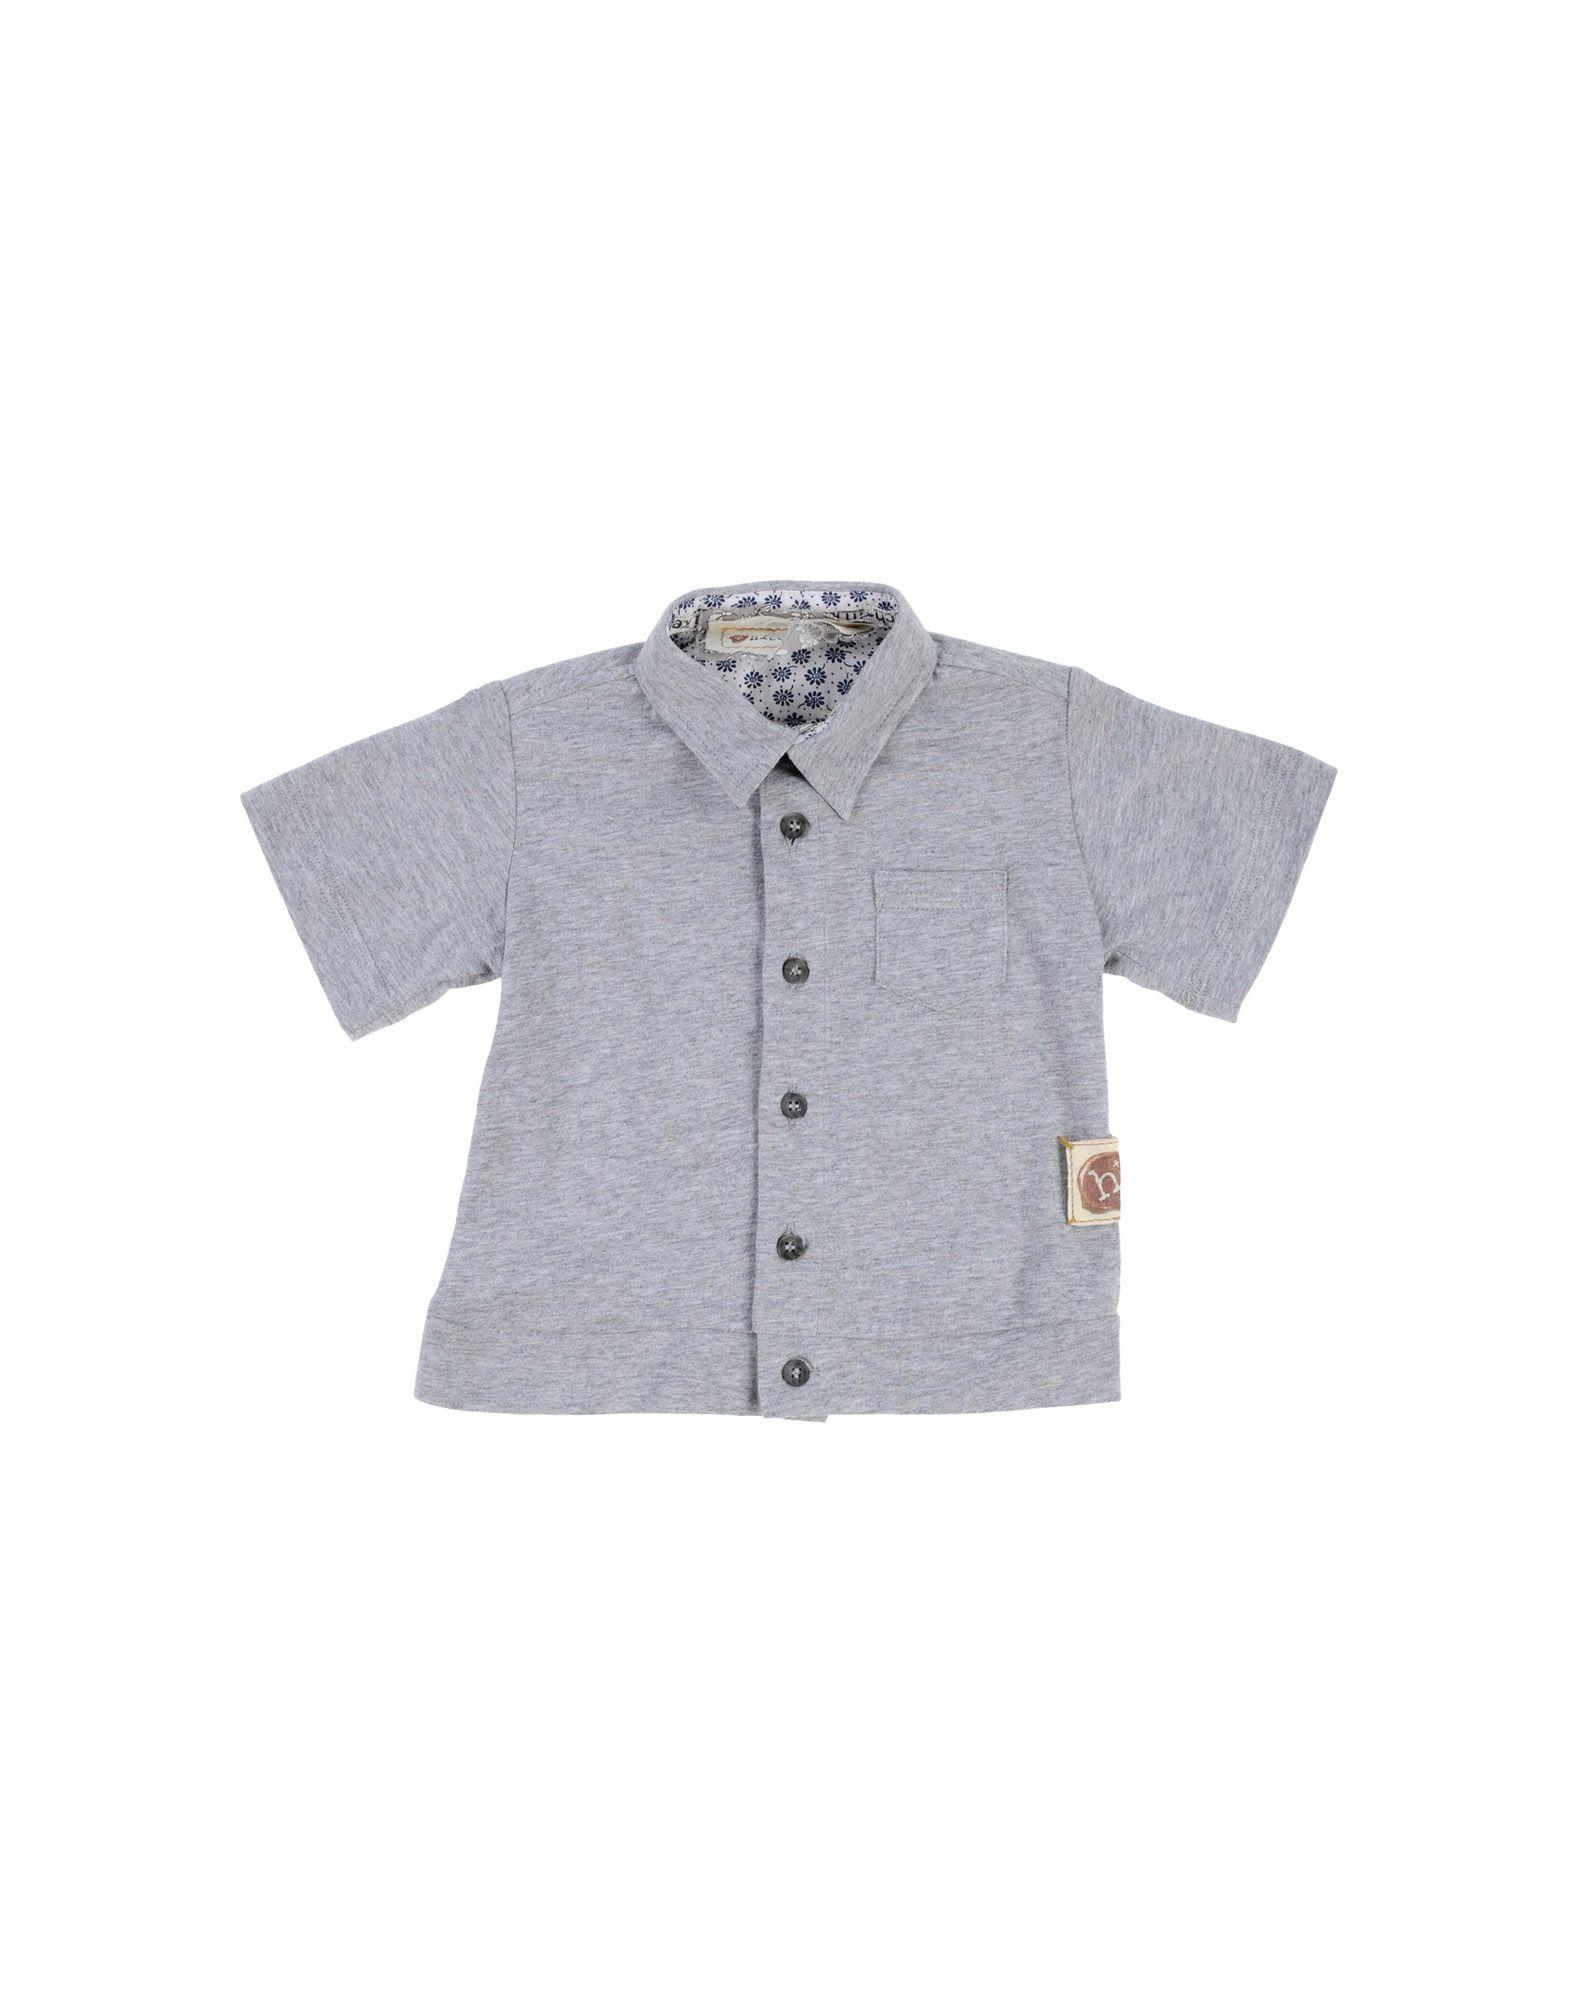 SHIRTS Hitch-Hiker Grey Boy Cotton